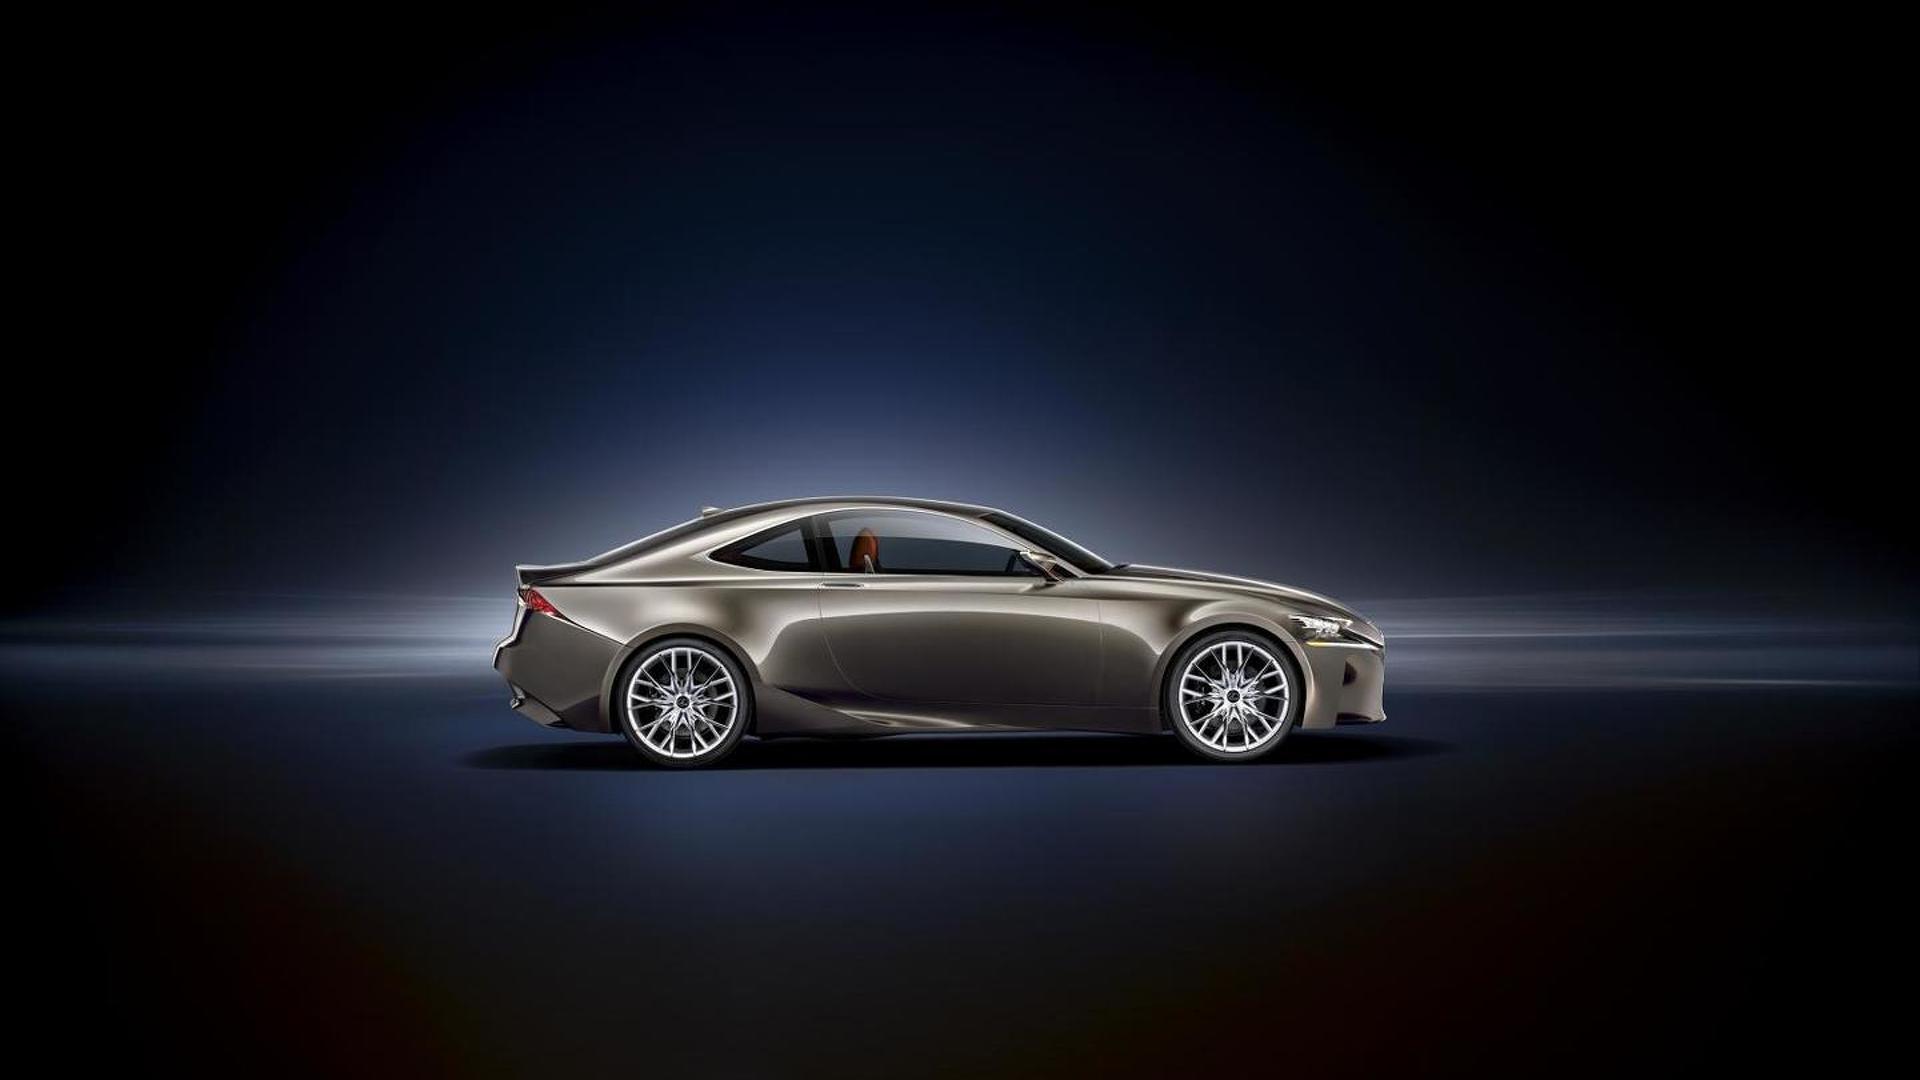 Lexus LF-CC video released